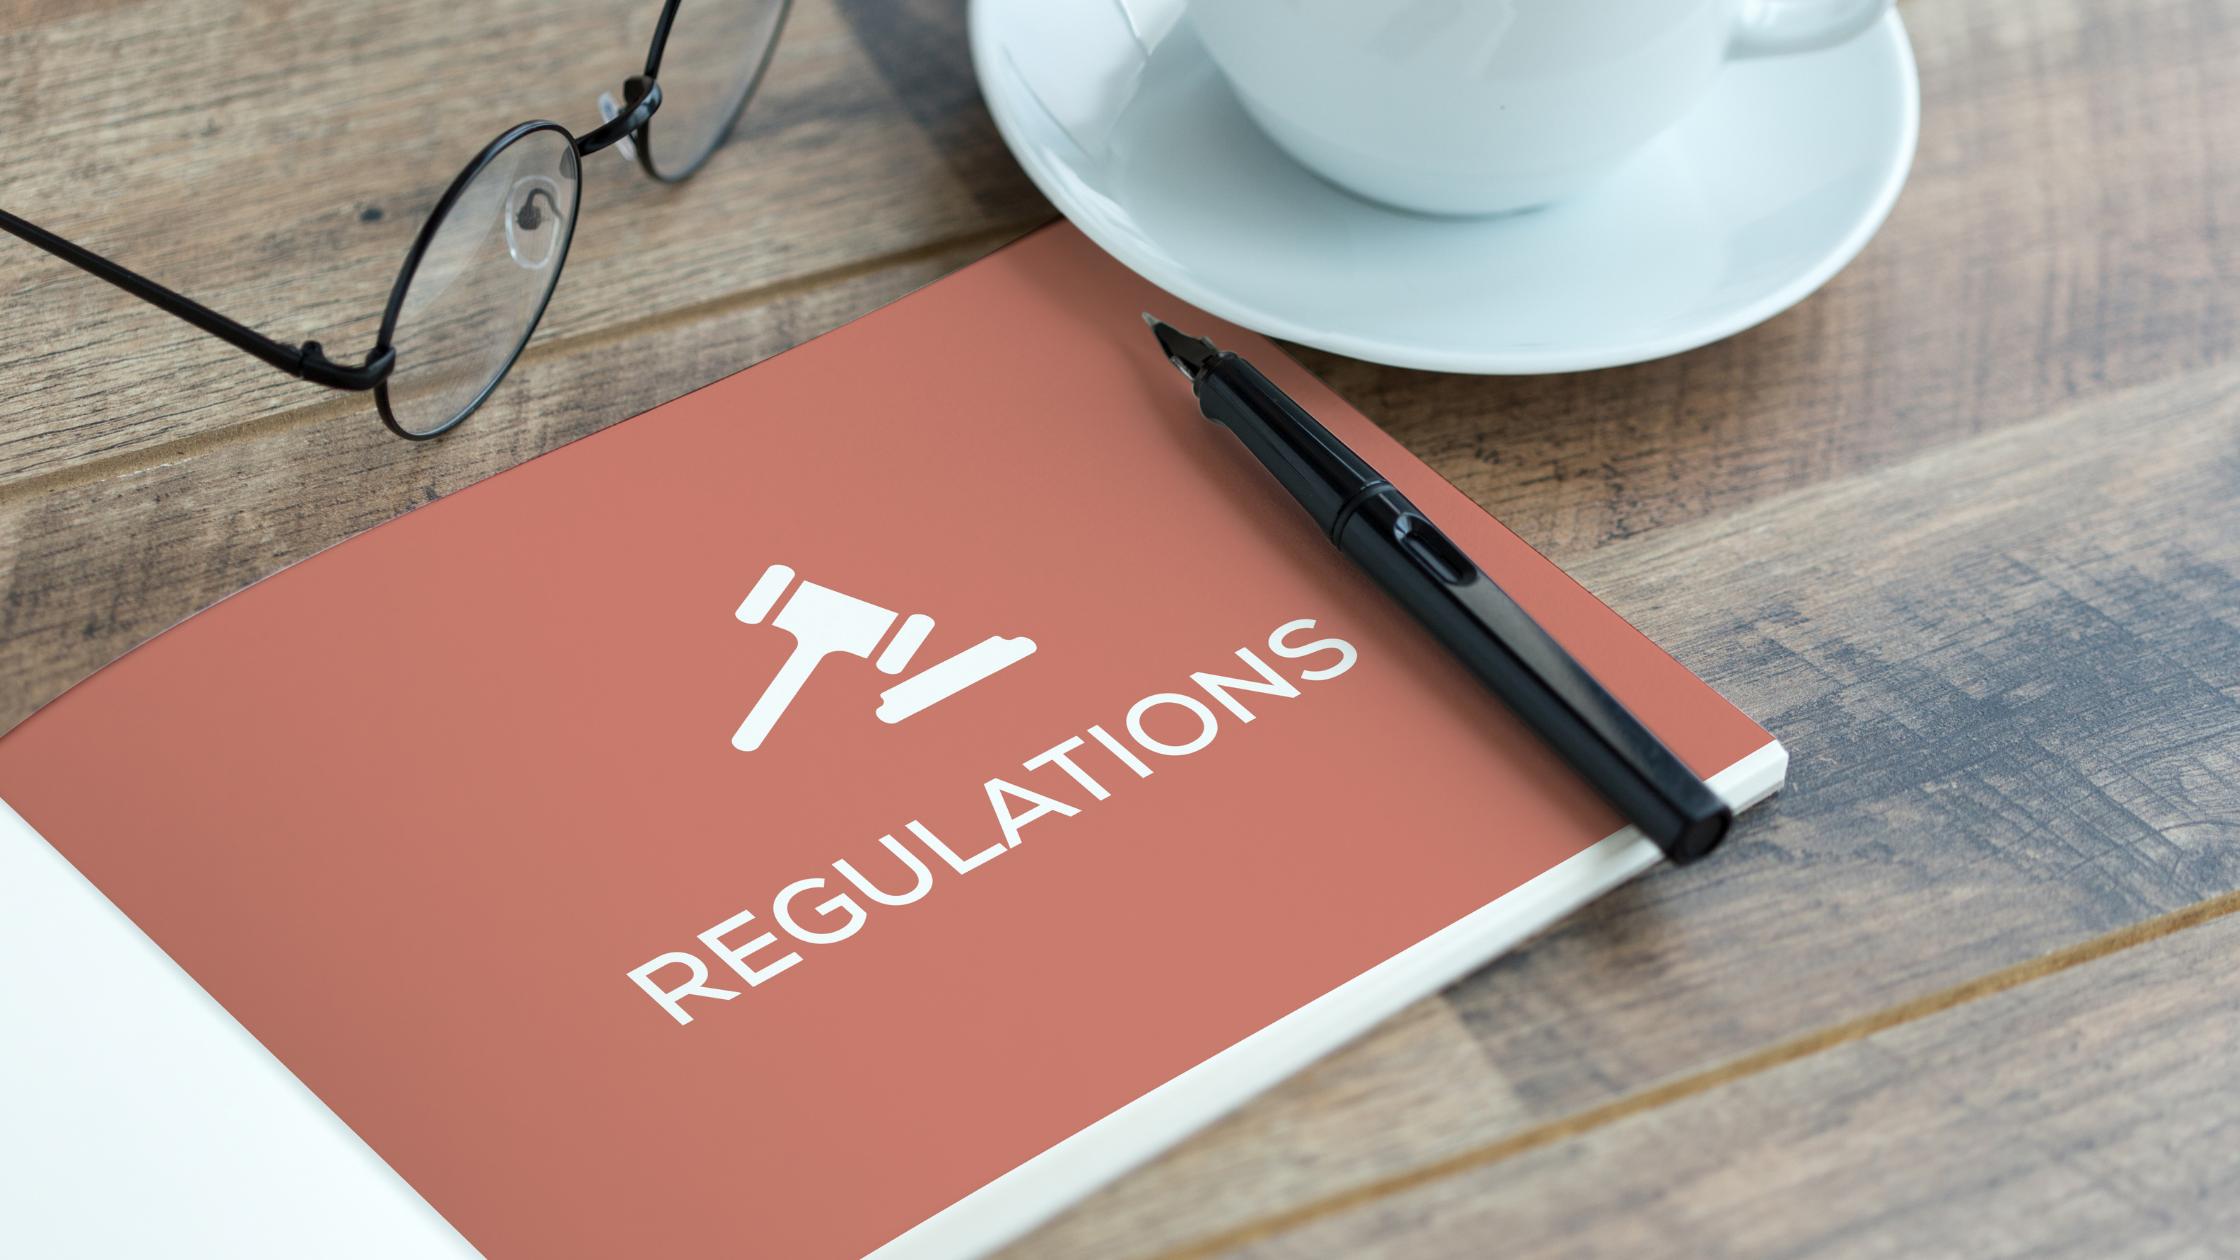 Canadian Federal Food Safety and Restaurant Regulation